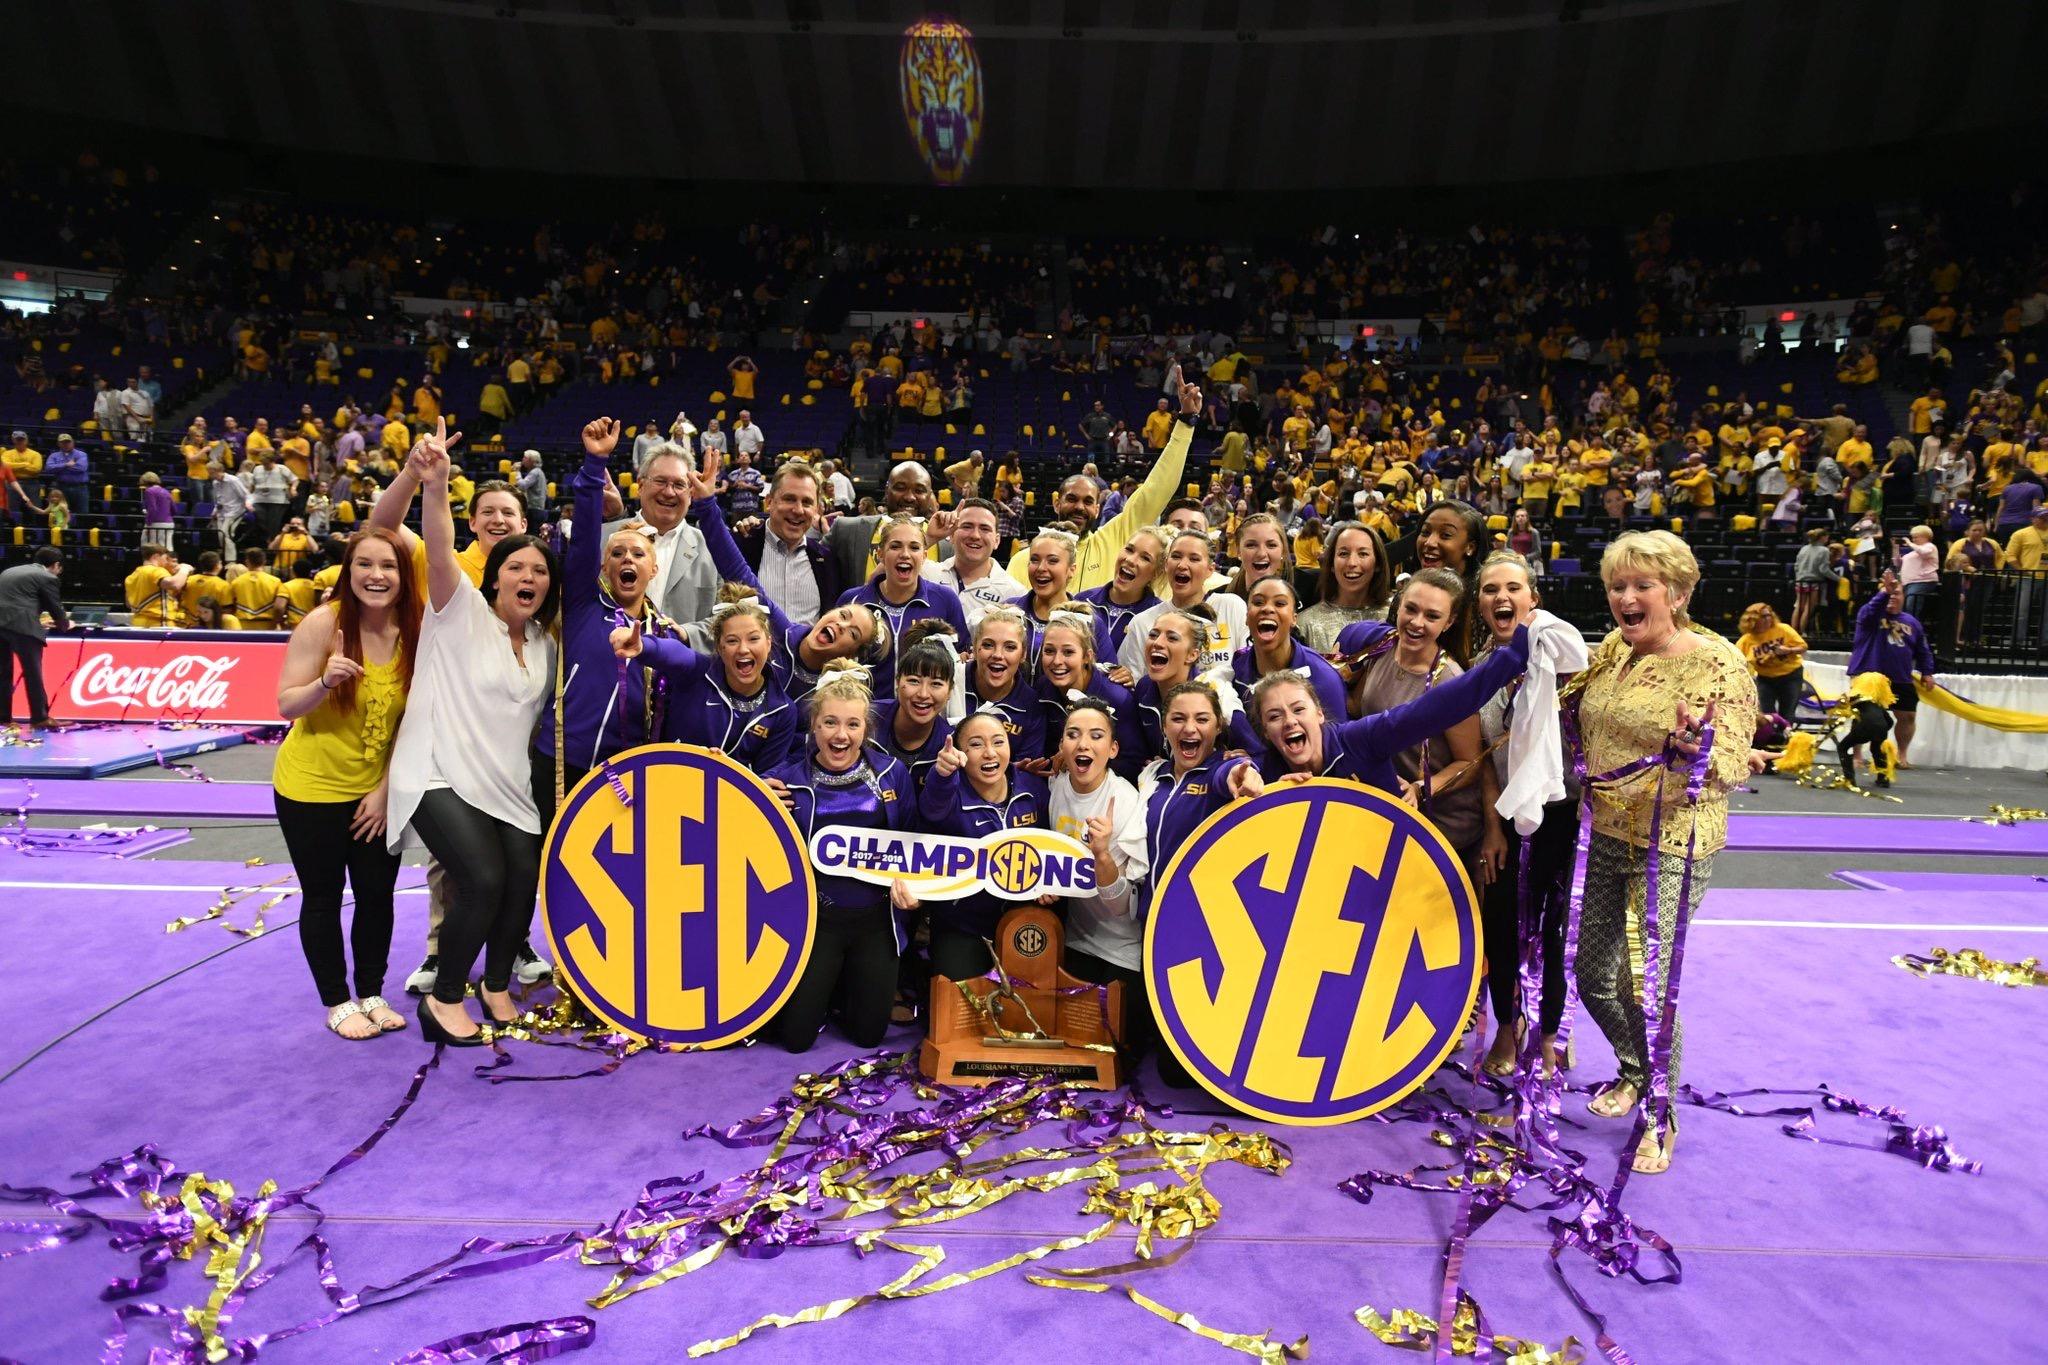 Gym wins second straight SEC regular-season title